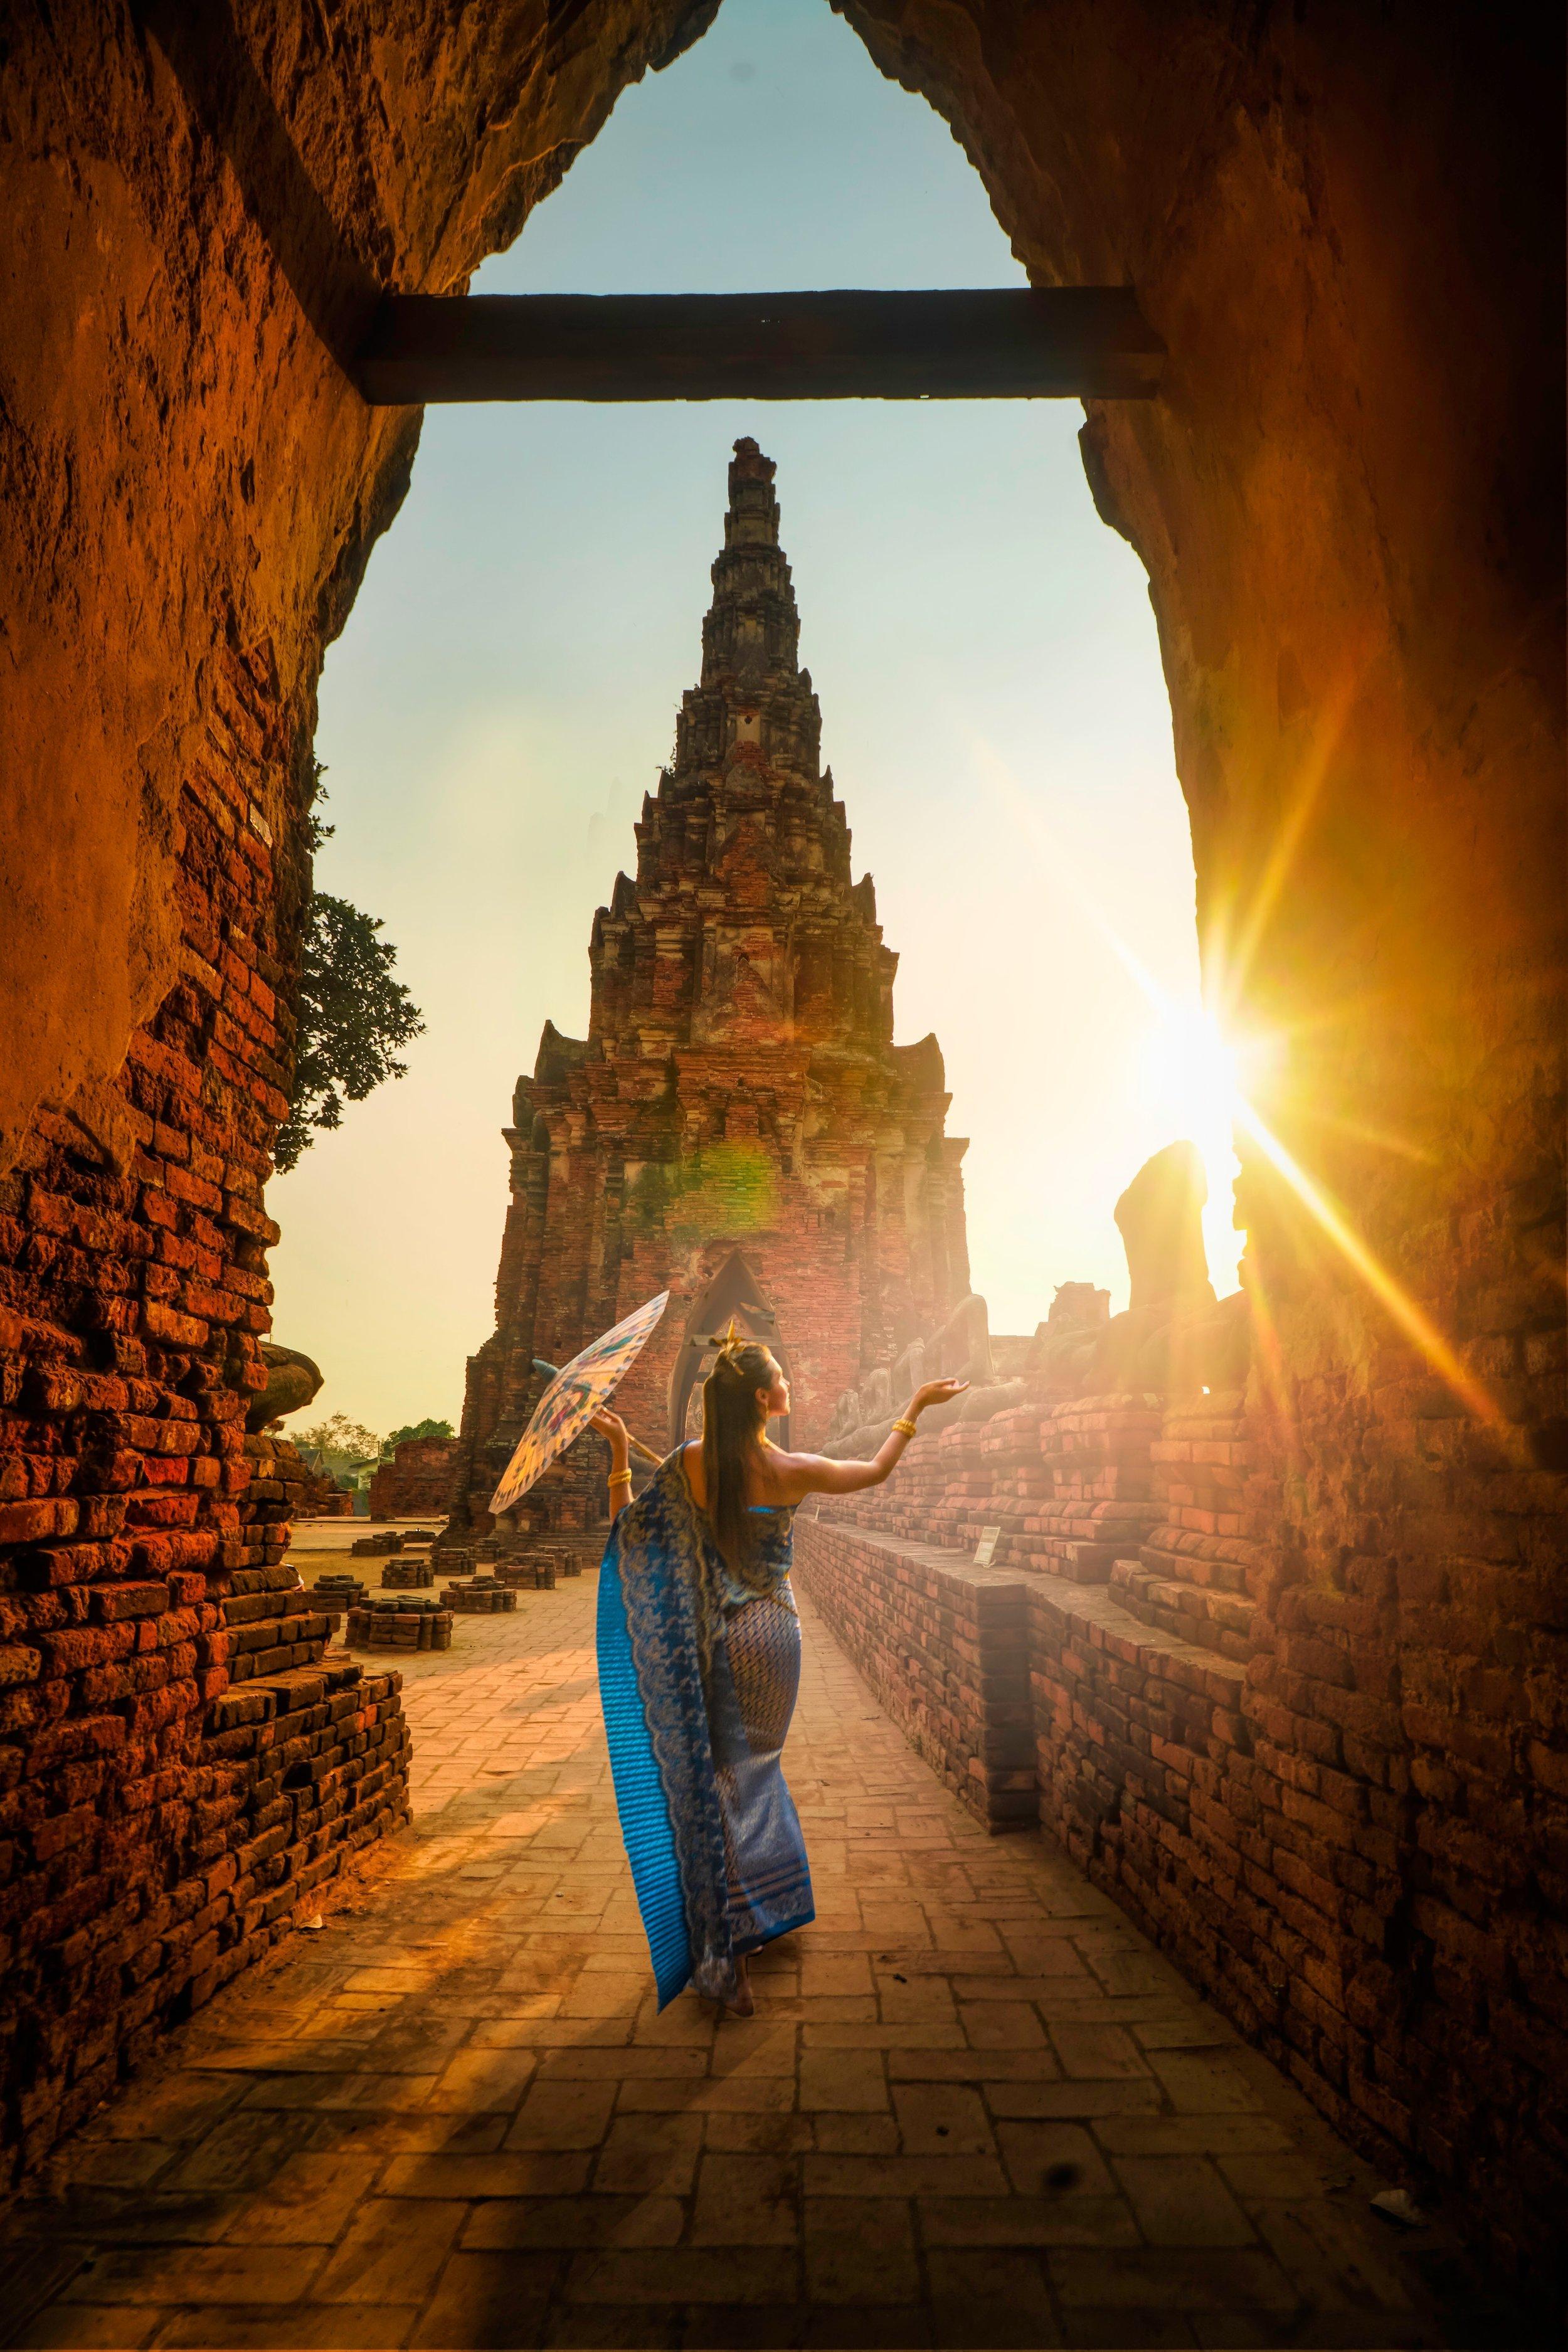 amazing-thailand-ancient-architecture-2070485.jpg